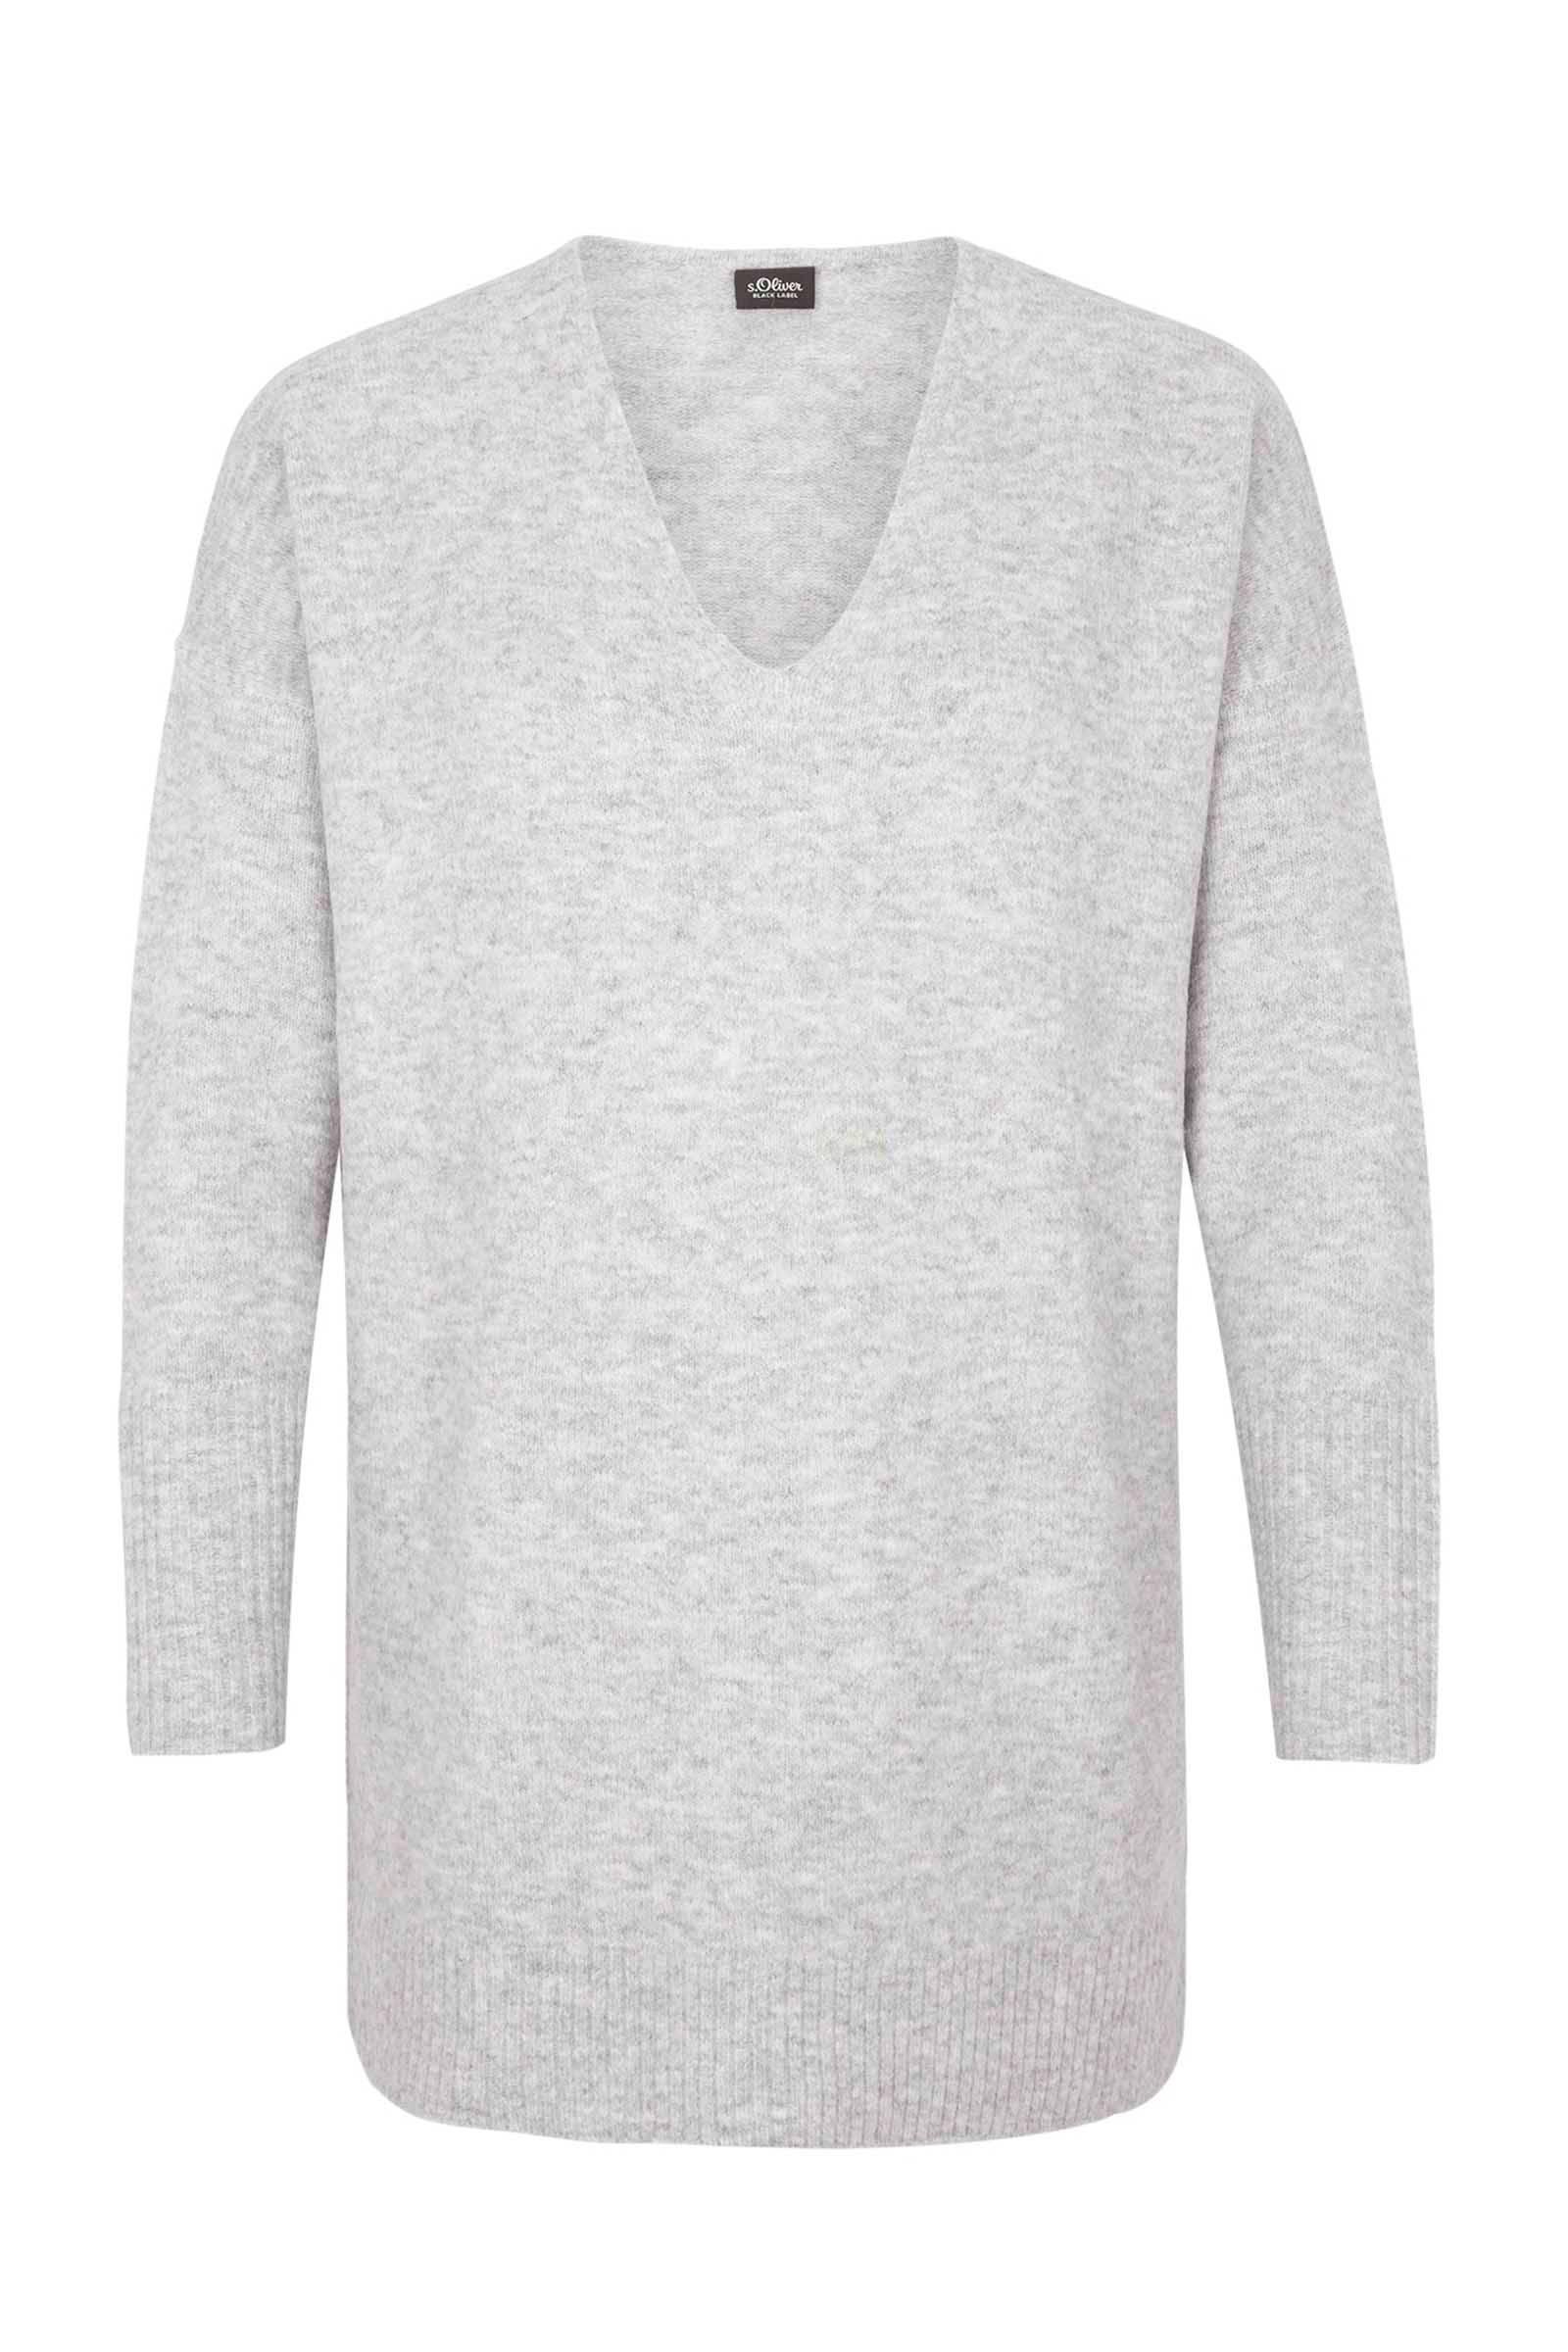 s.Oliver BLACK LABEL lange trui met wol | wehkamp